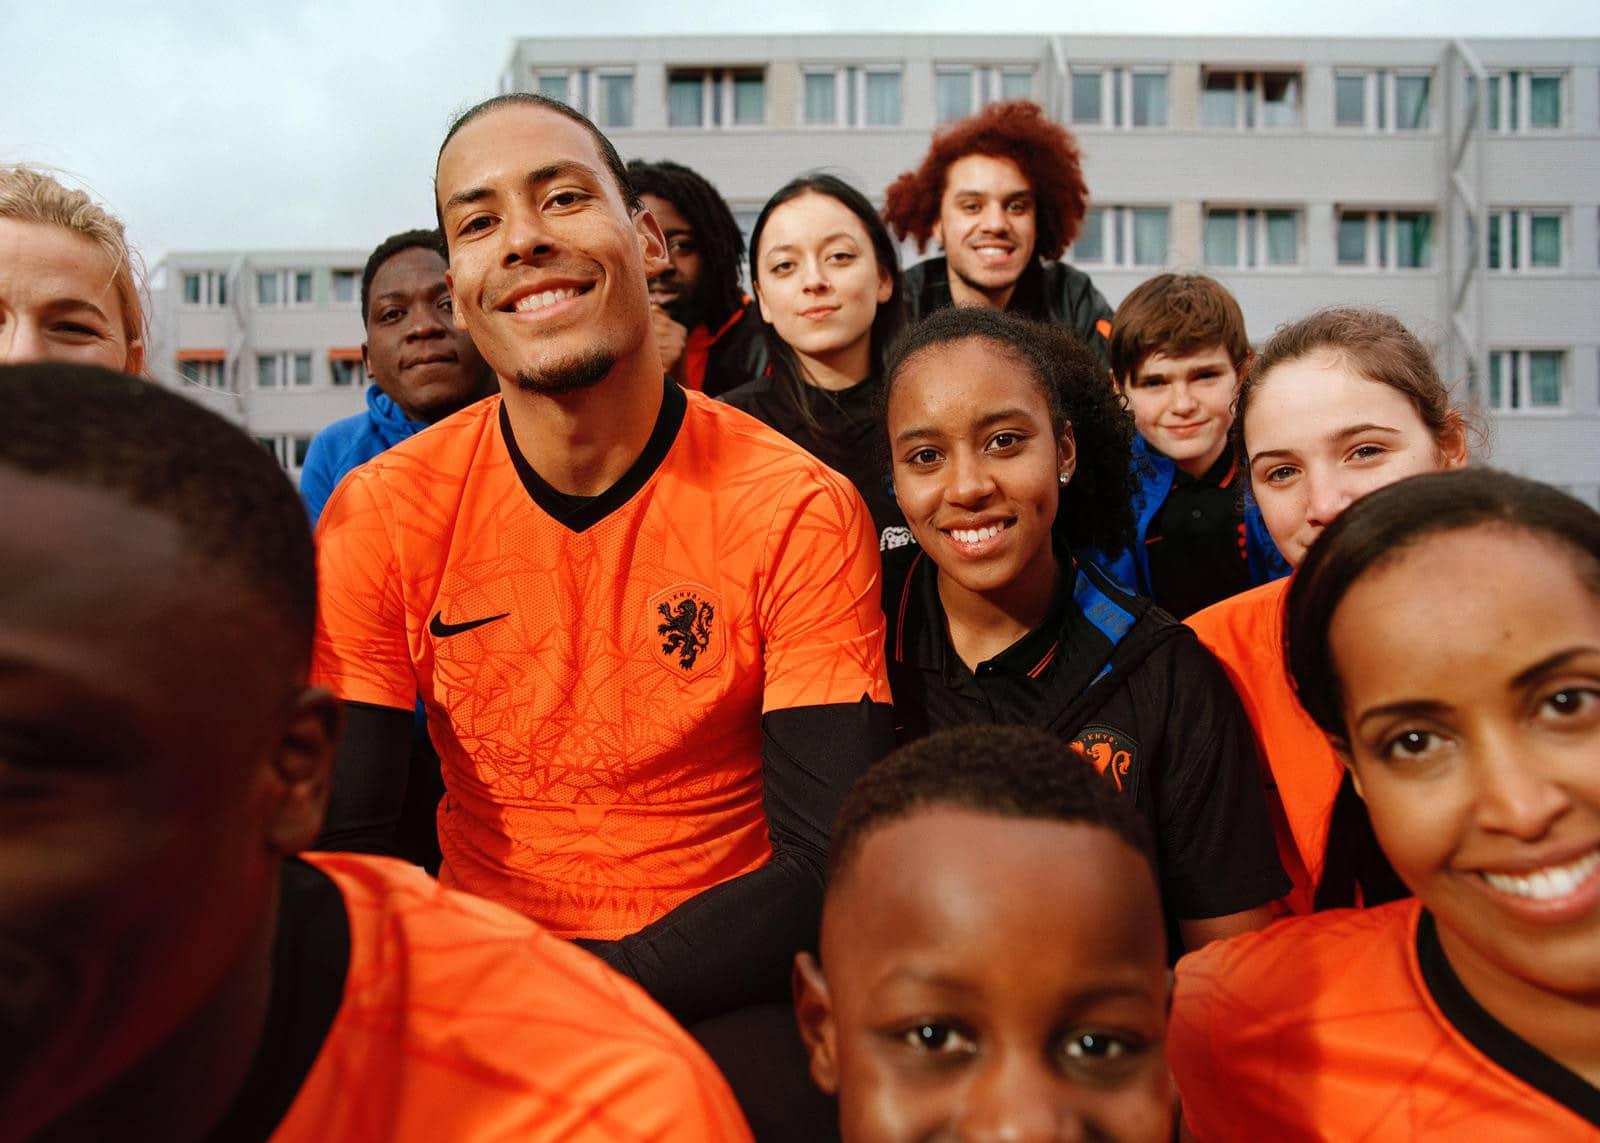 nederlands elftal thuisshirt ek 2021